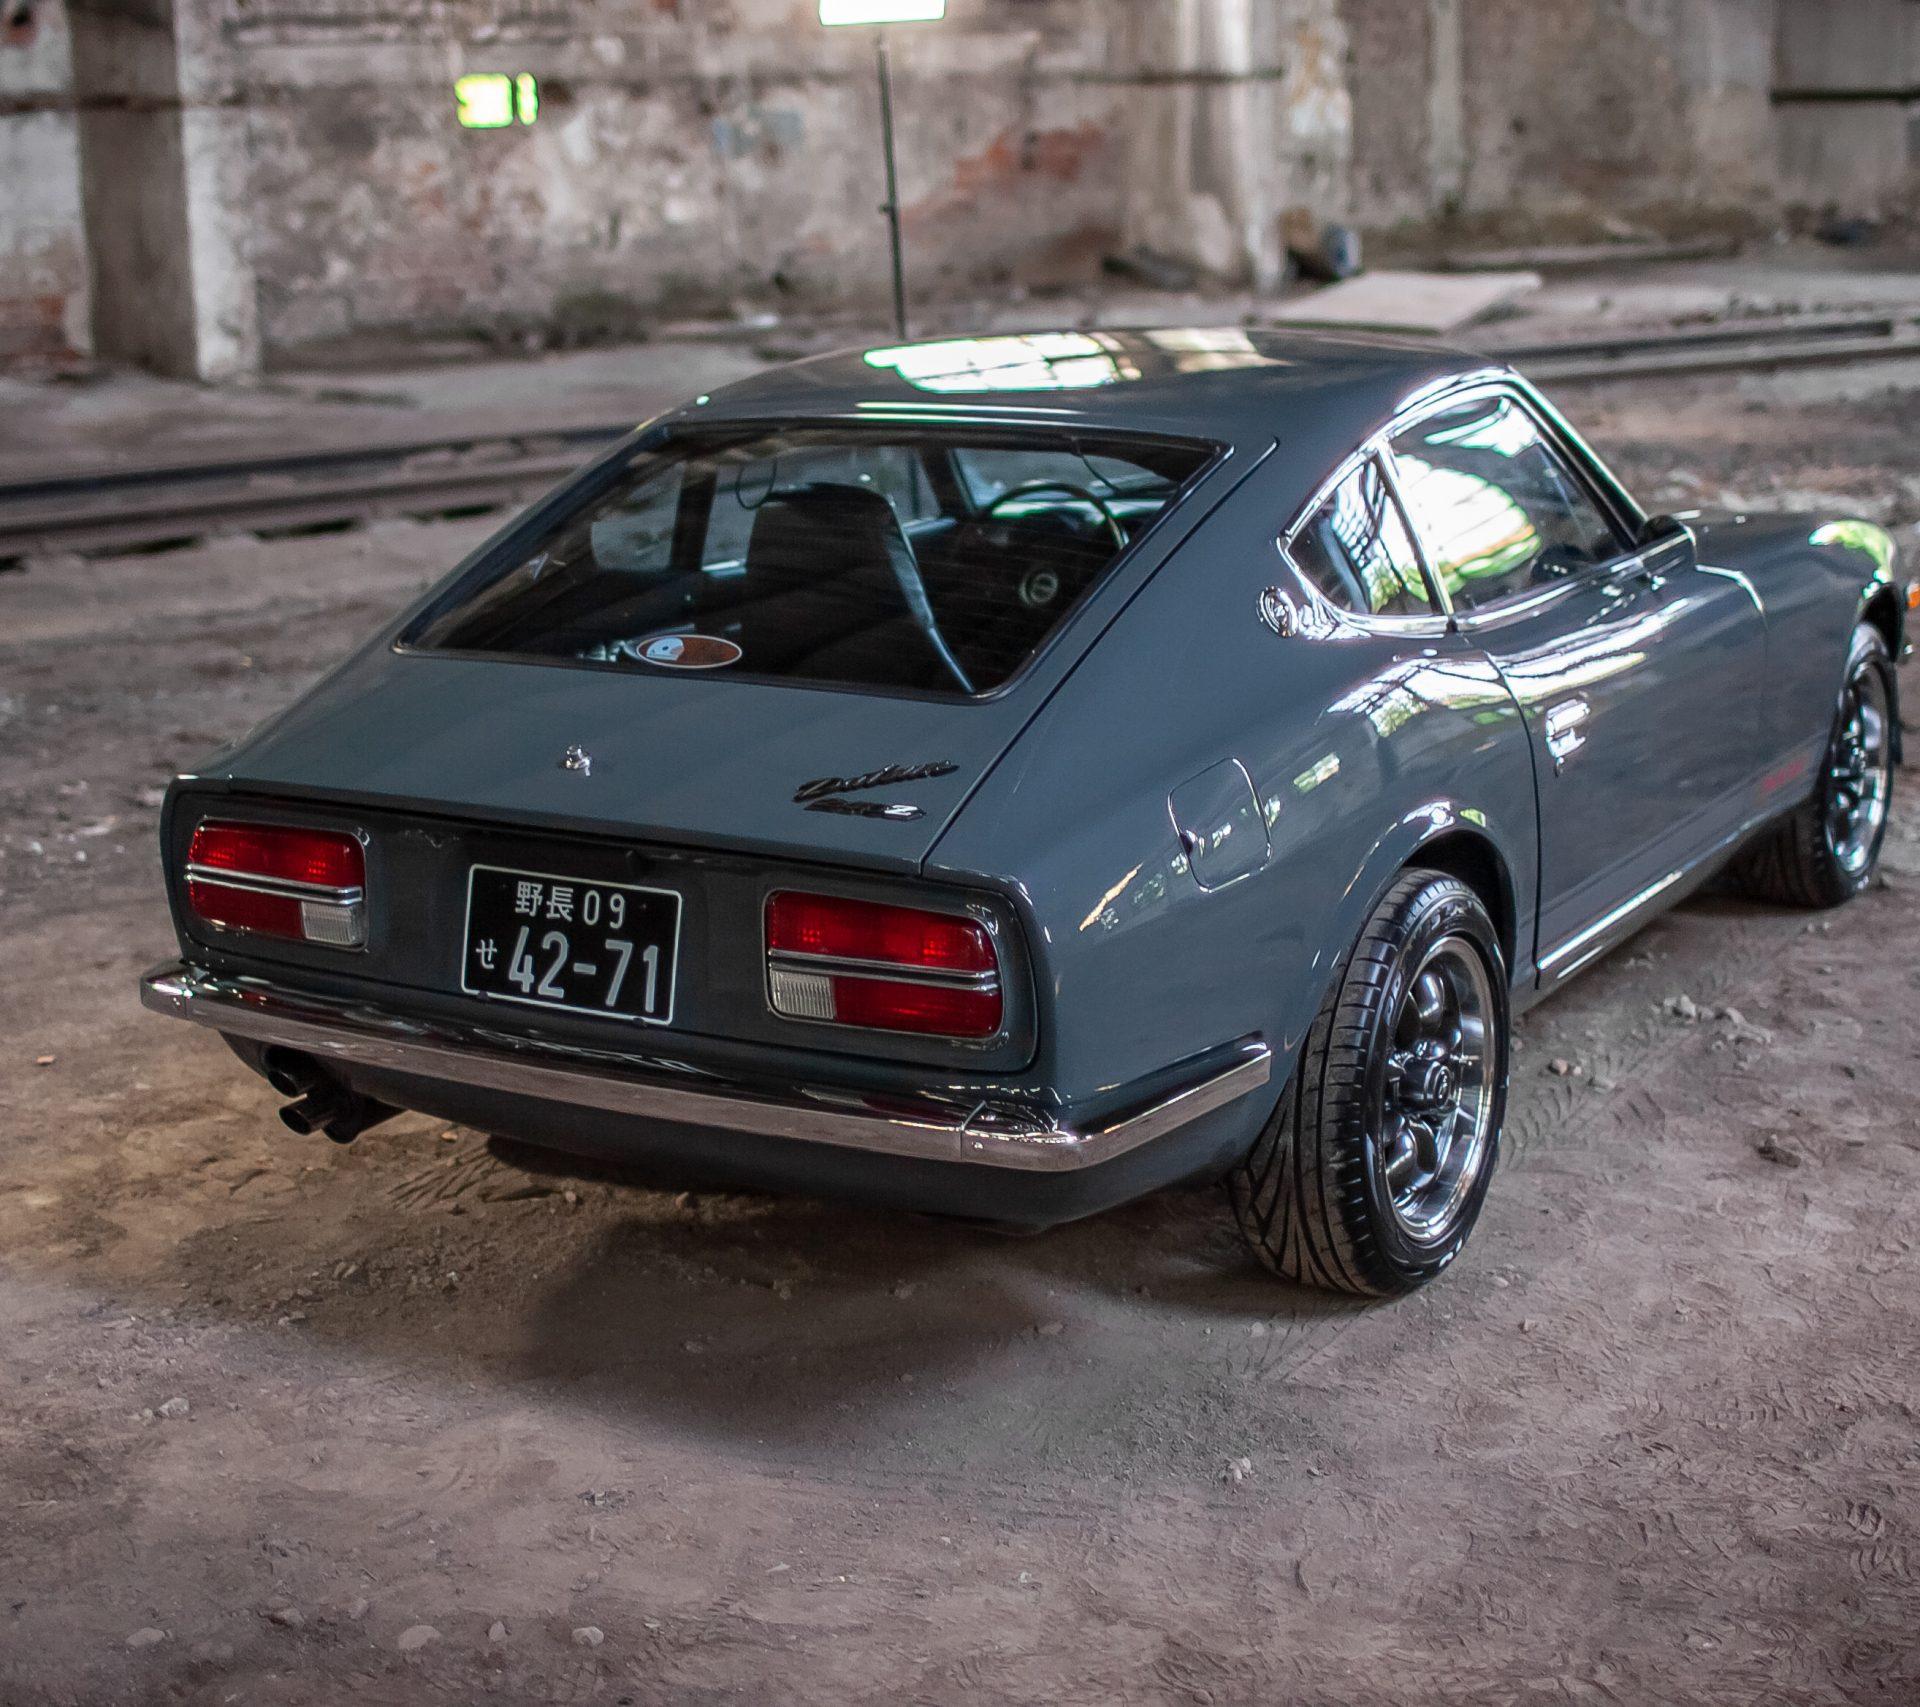 1972 Nissan Datsun 240z Fairlady Verkaufen Gebraucht